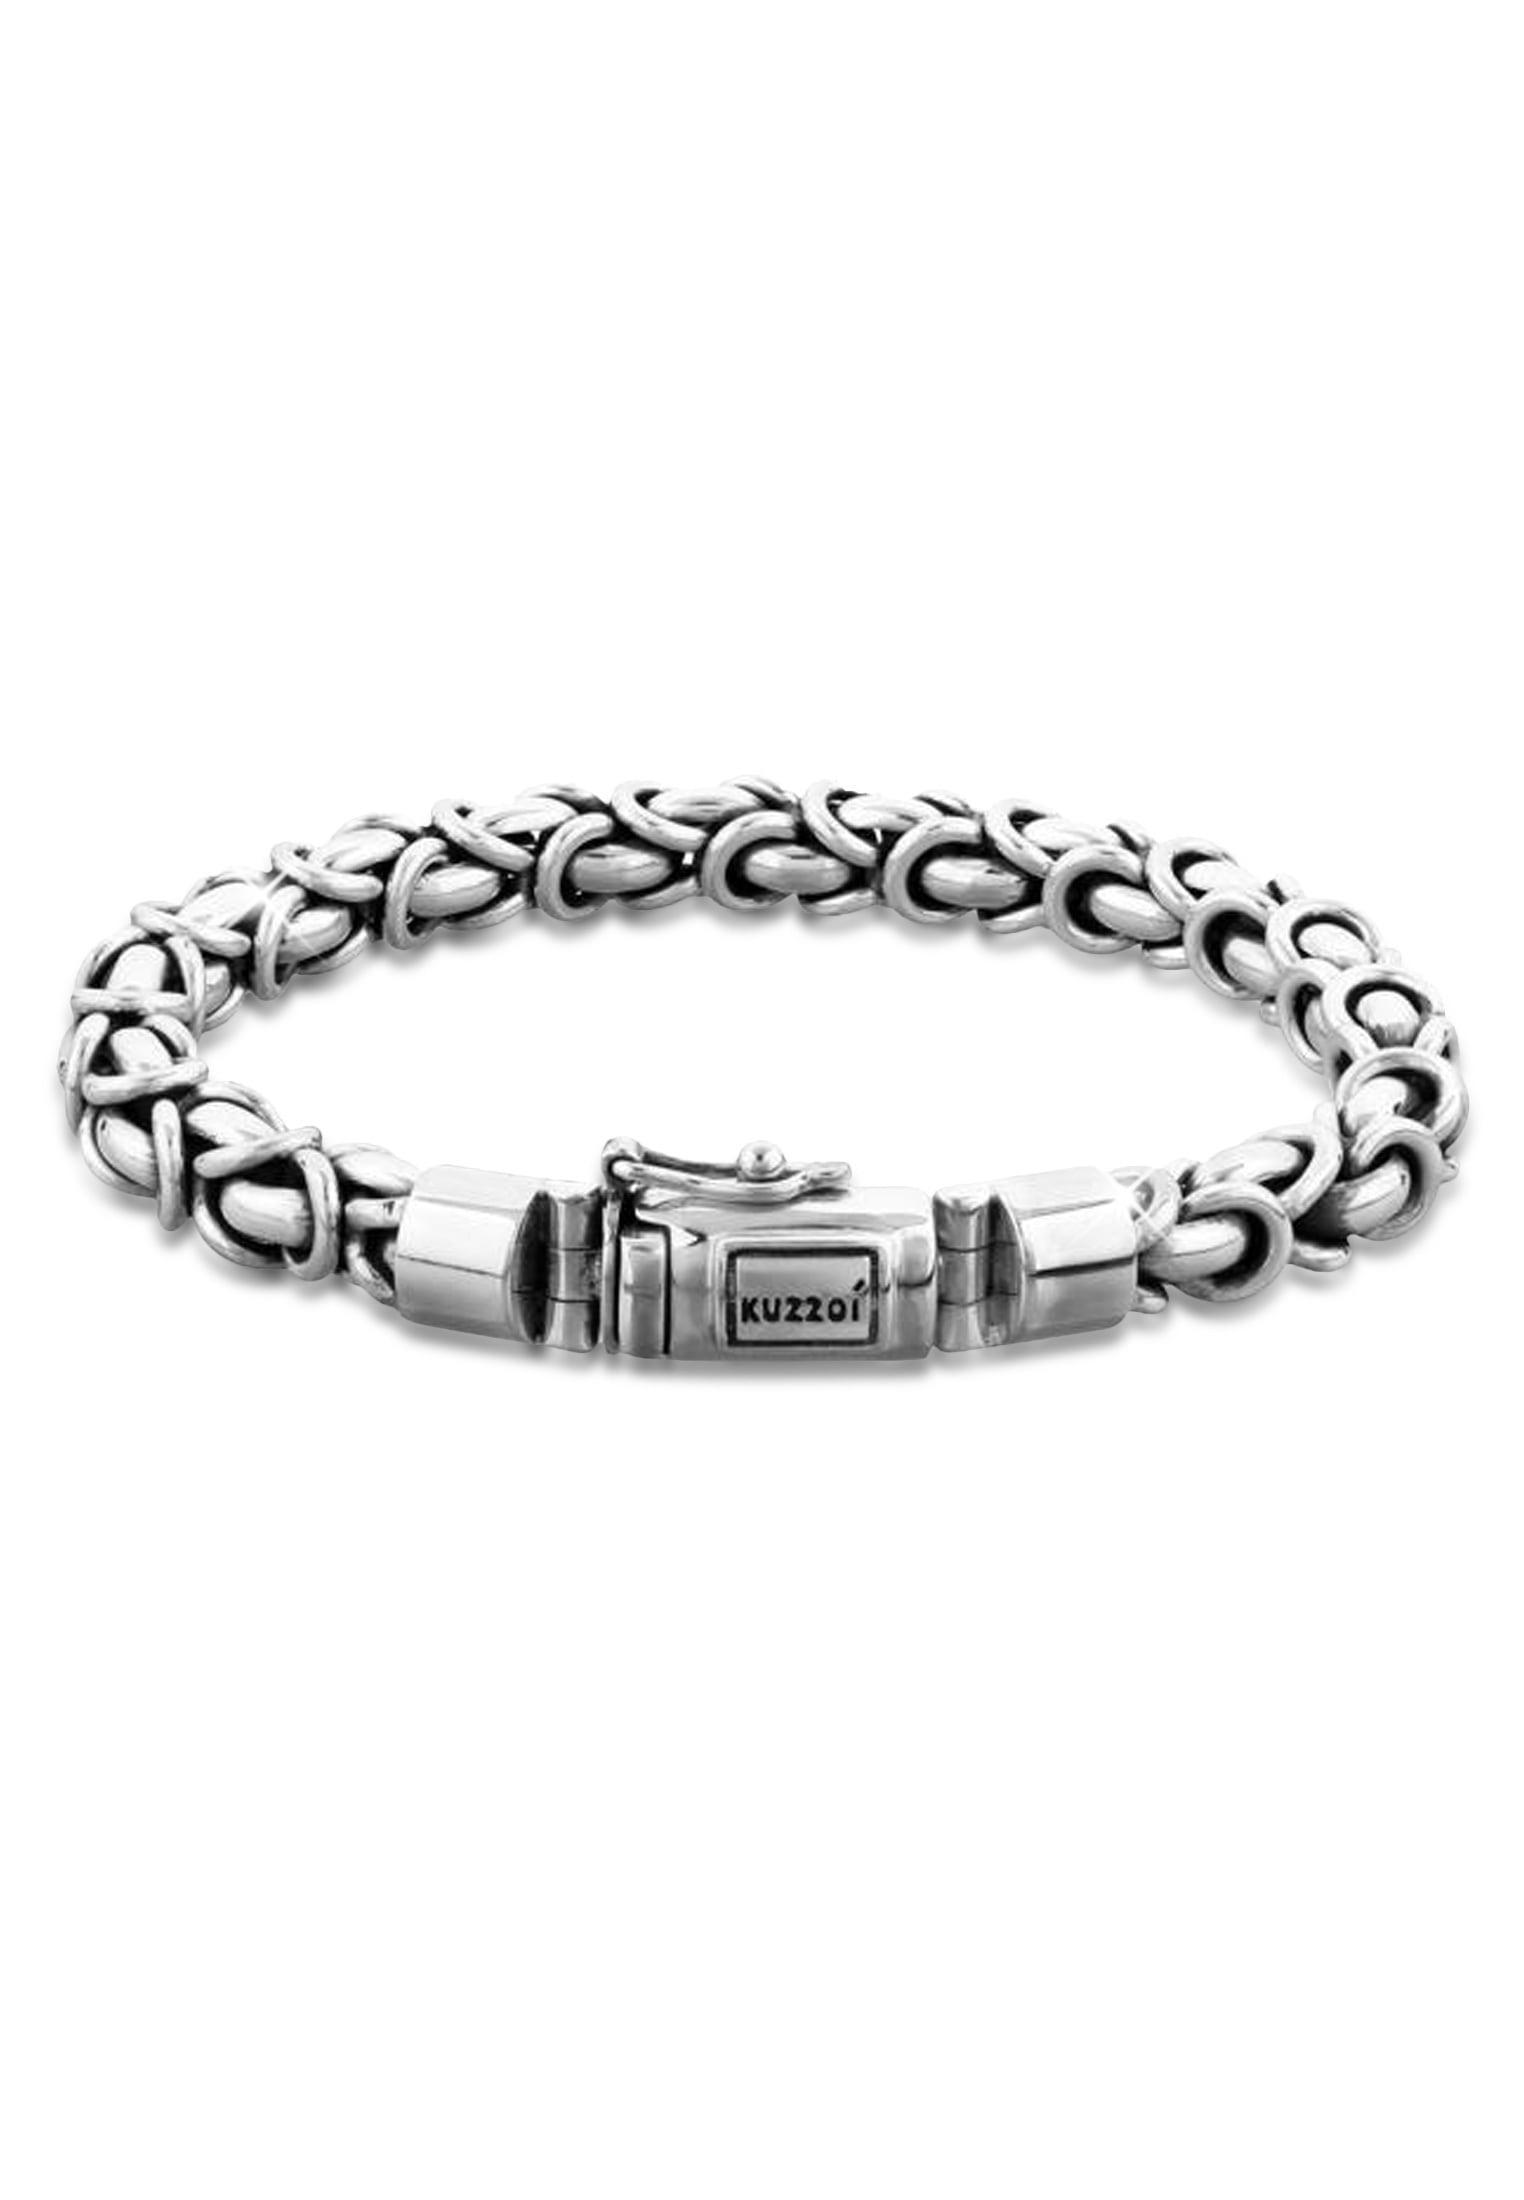 Kuzzoi Armband Herren Panzerarmband Königskette Basic 925 Silber | Schmuck > Armbänder > Silberarmbänder | Kuzzoi